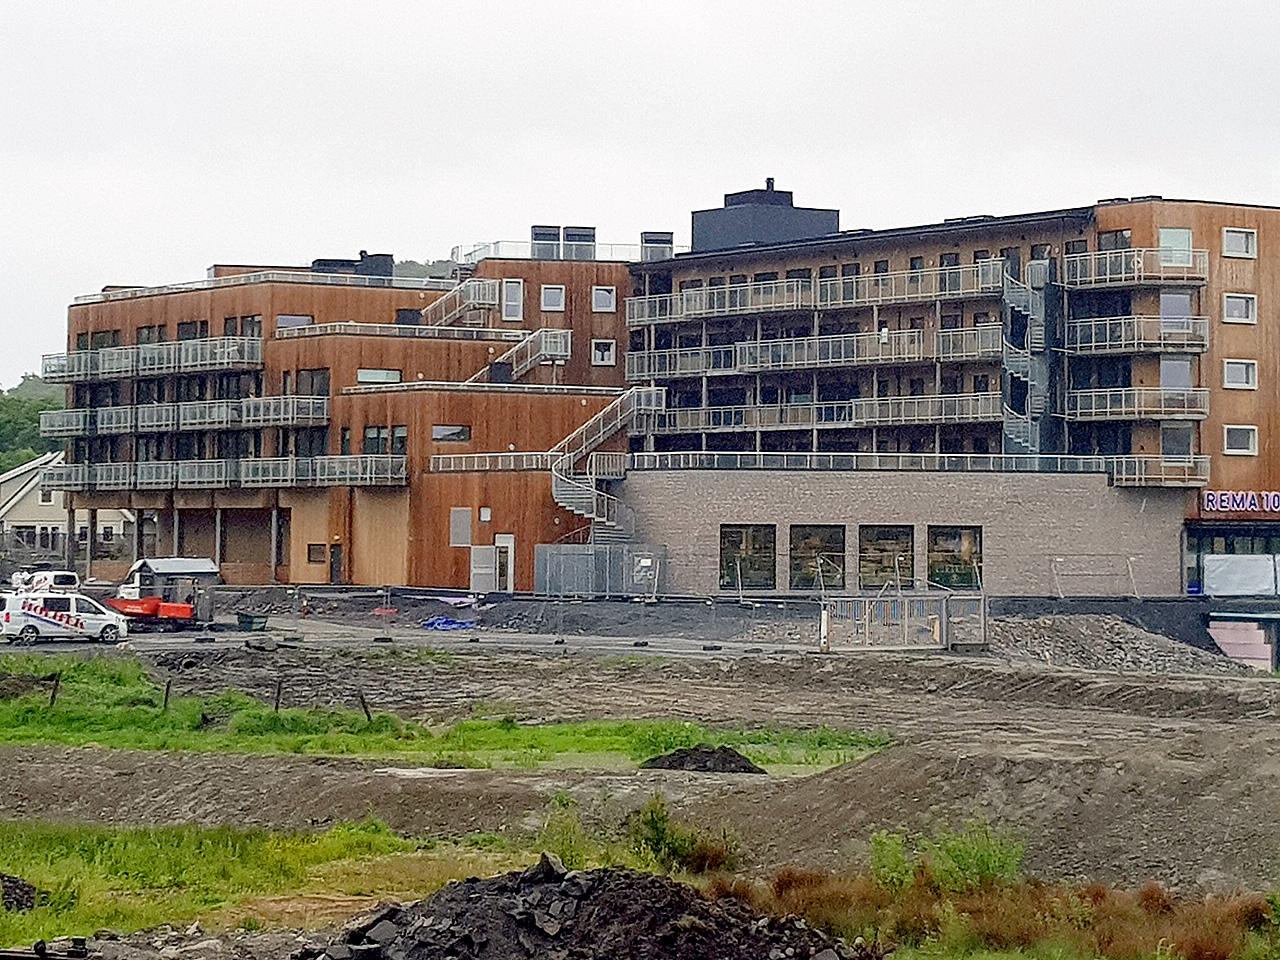 bjoerndalen-kf5-pks-industri-referanse-main2